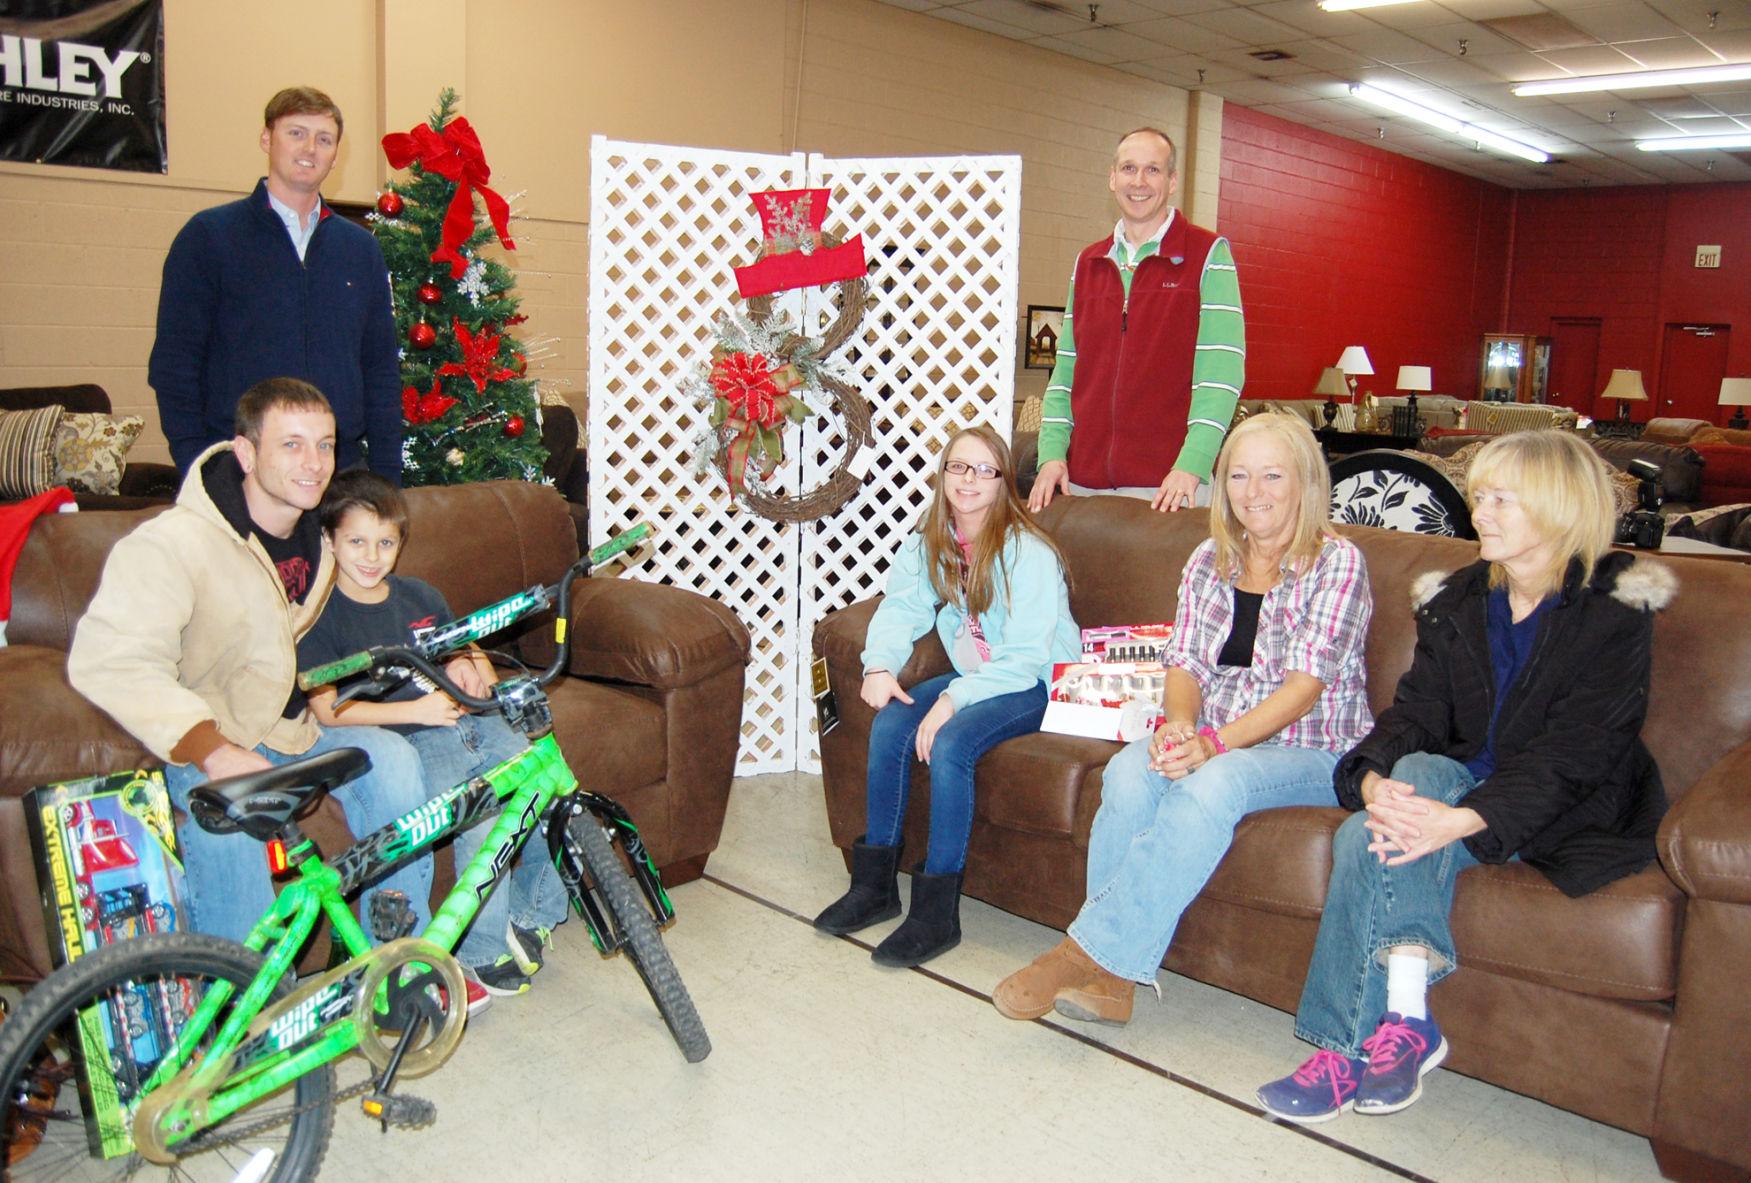 Roberts Furniture Donates To 2 Families In Need   Local News    Greenevillesun.com